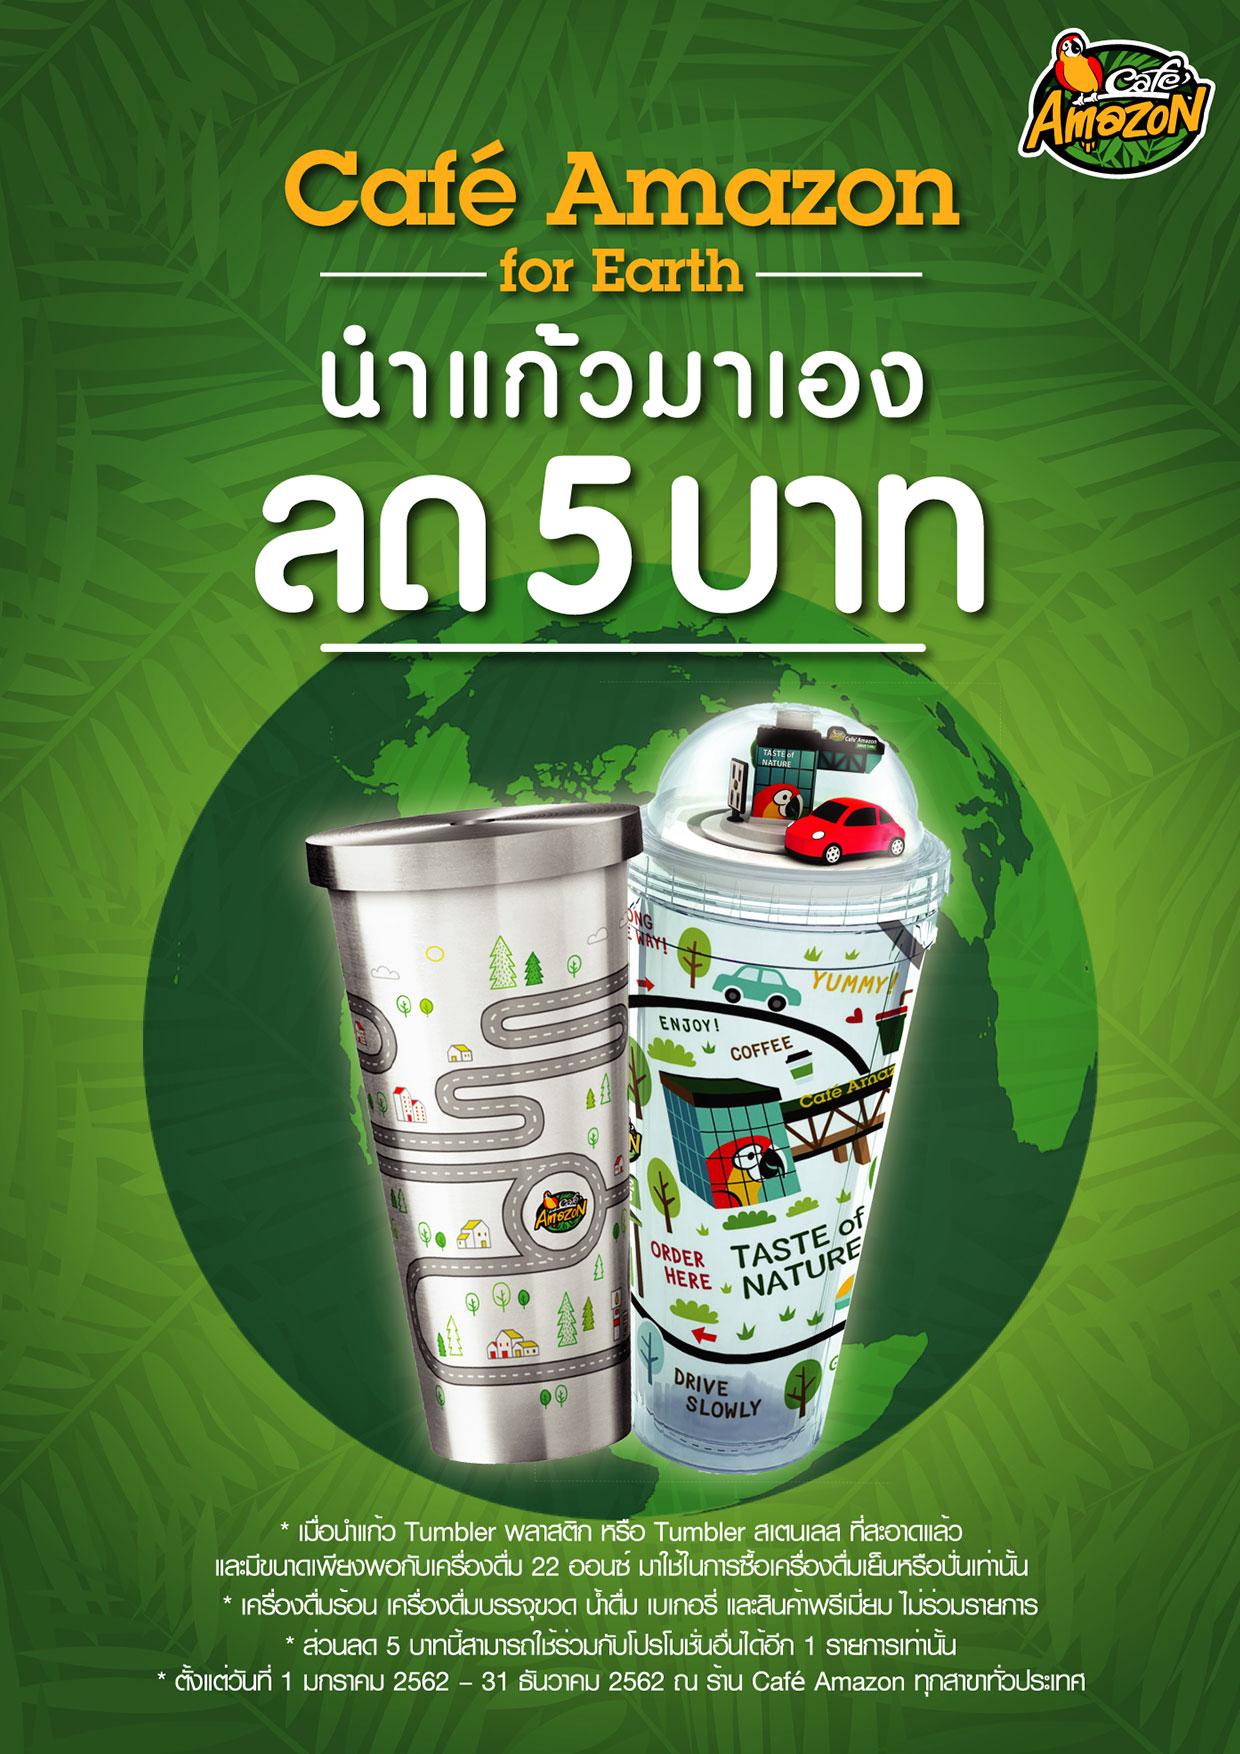 Cafe Amazon for Earth  ช่วยโลกร้อน